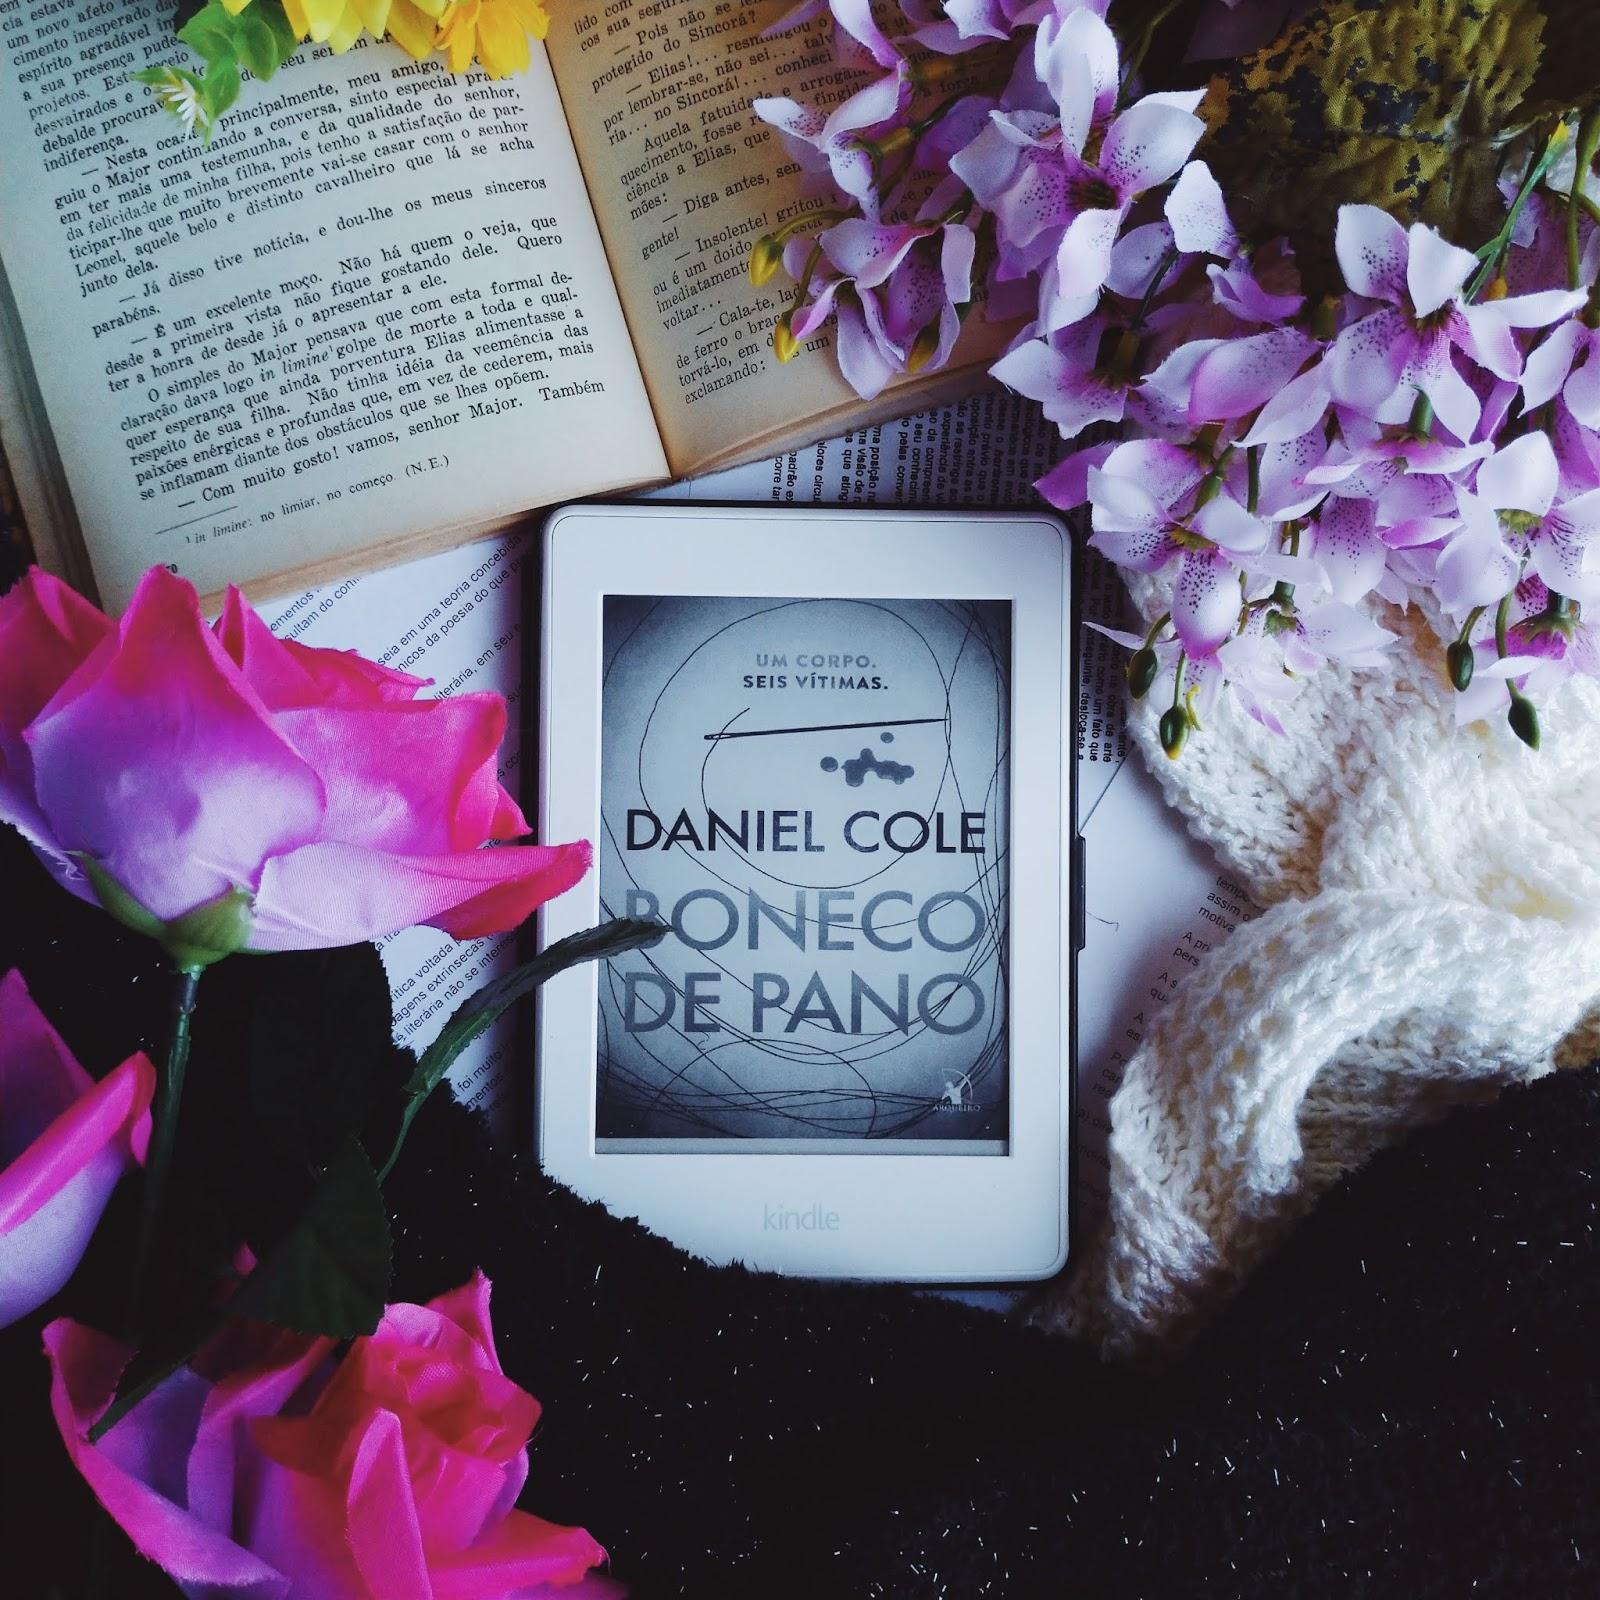 Boneco de Pano - Daniel Cole | Resenha